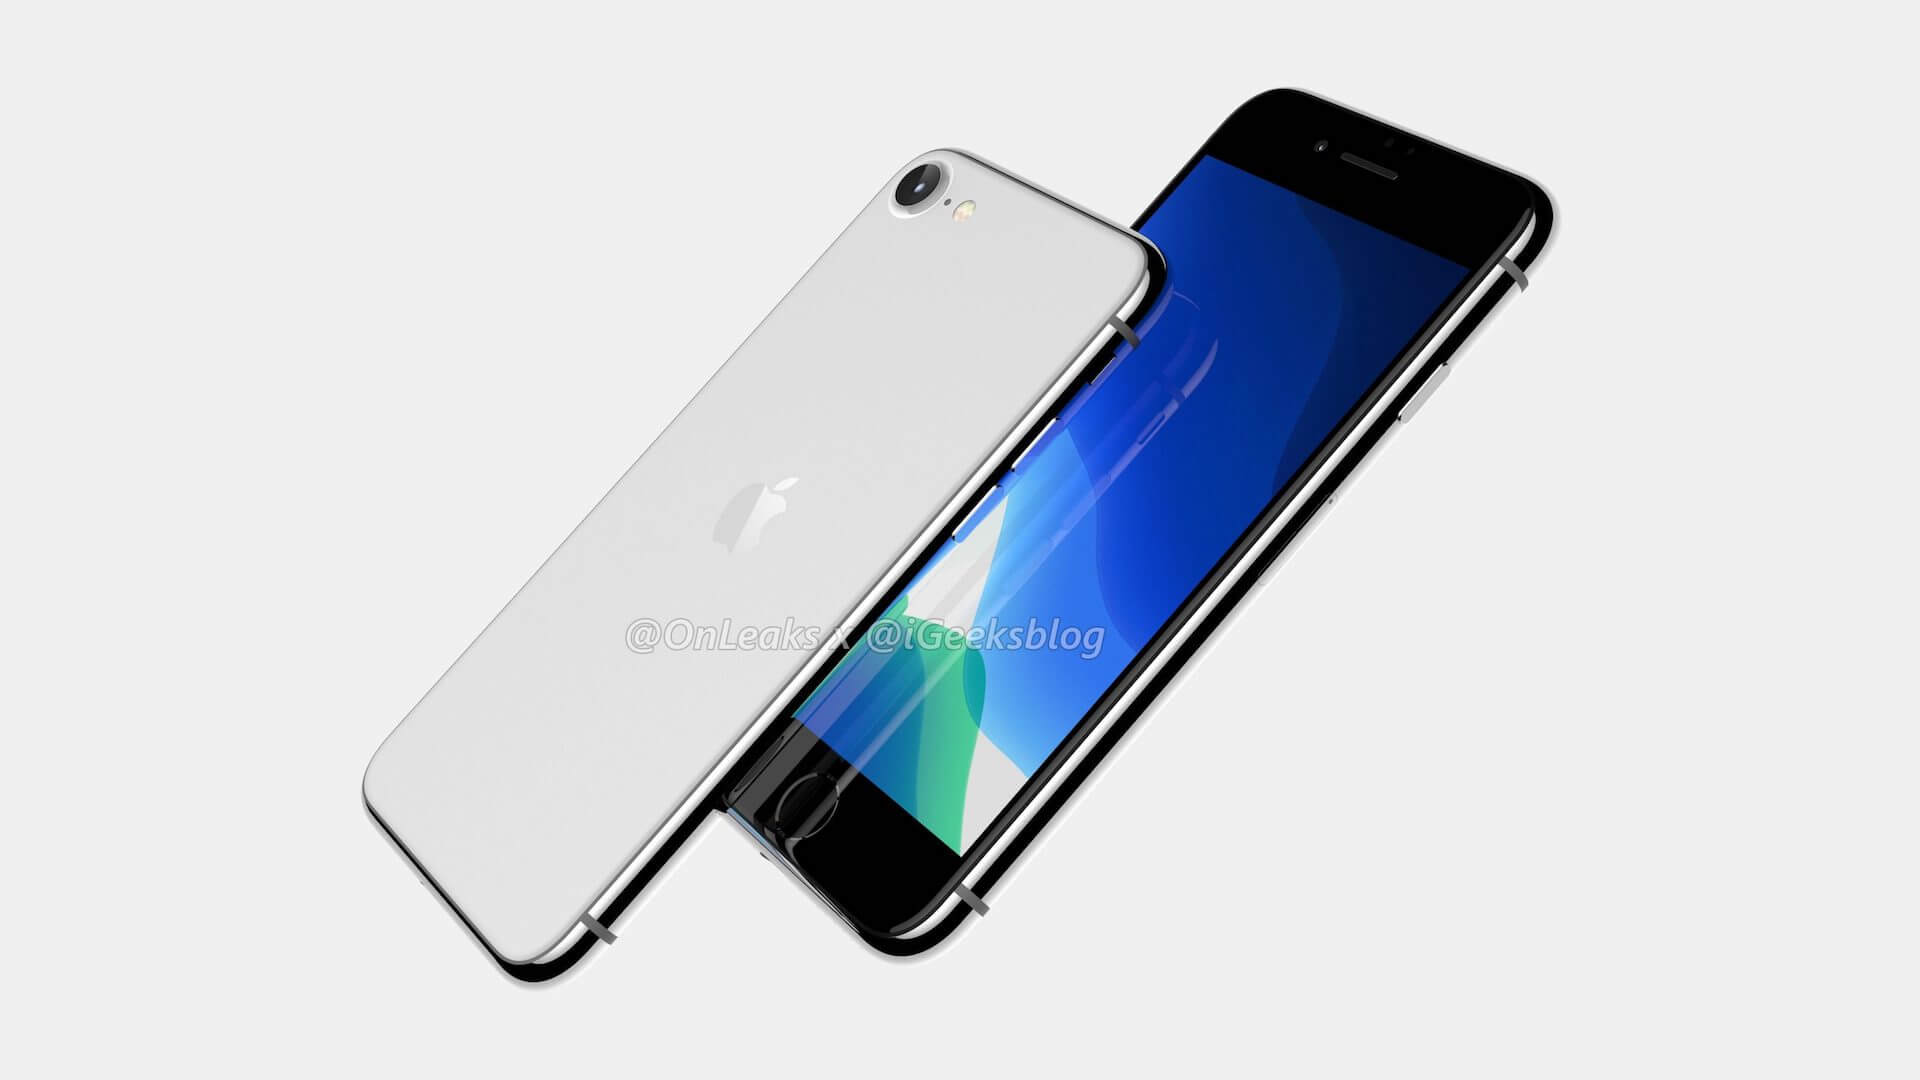 iPhone SE 2、ついに今年上半期に登場か!?「iPhone 9」のレンダリング画像が公開 tech200108_iphonese2_1